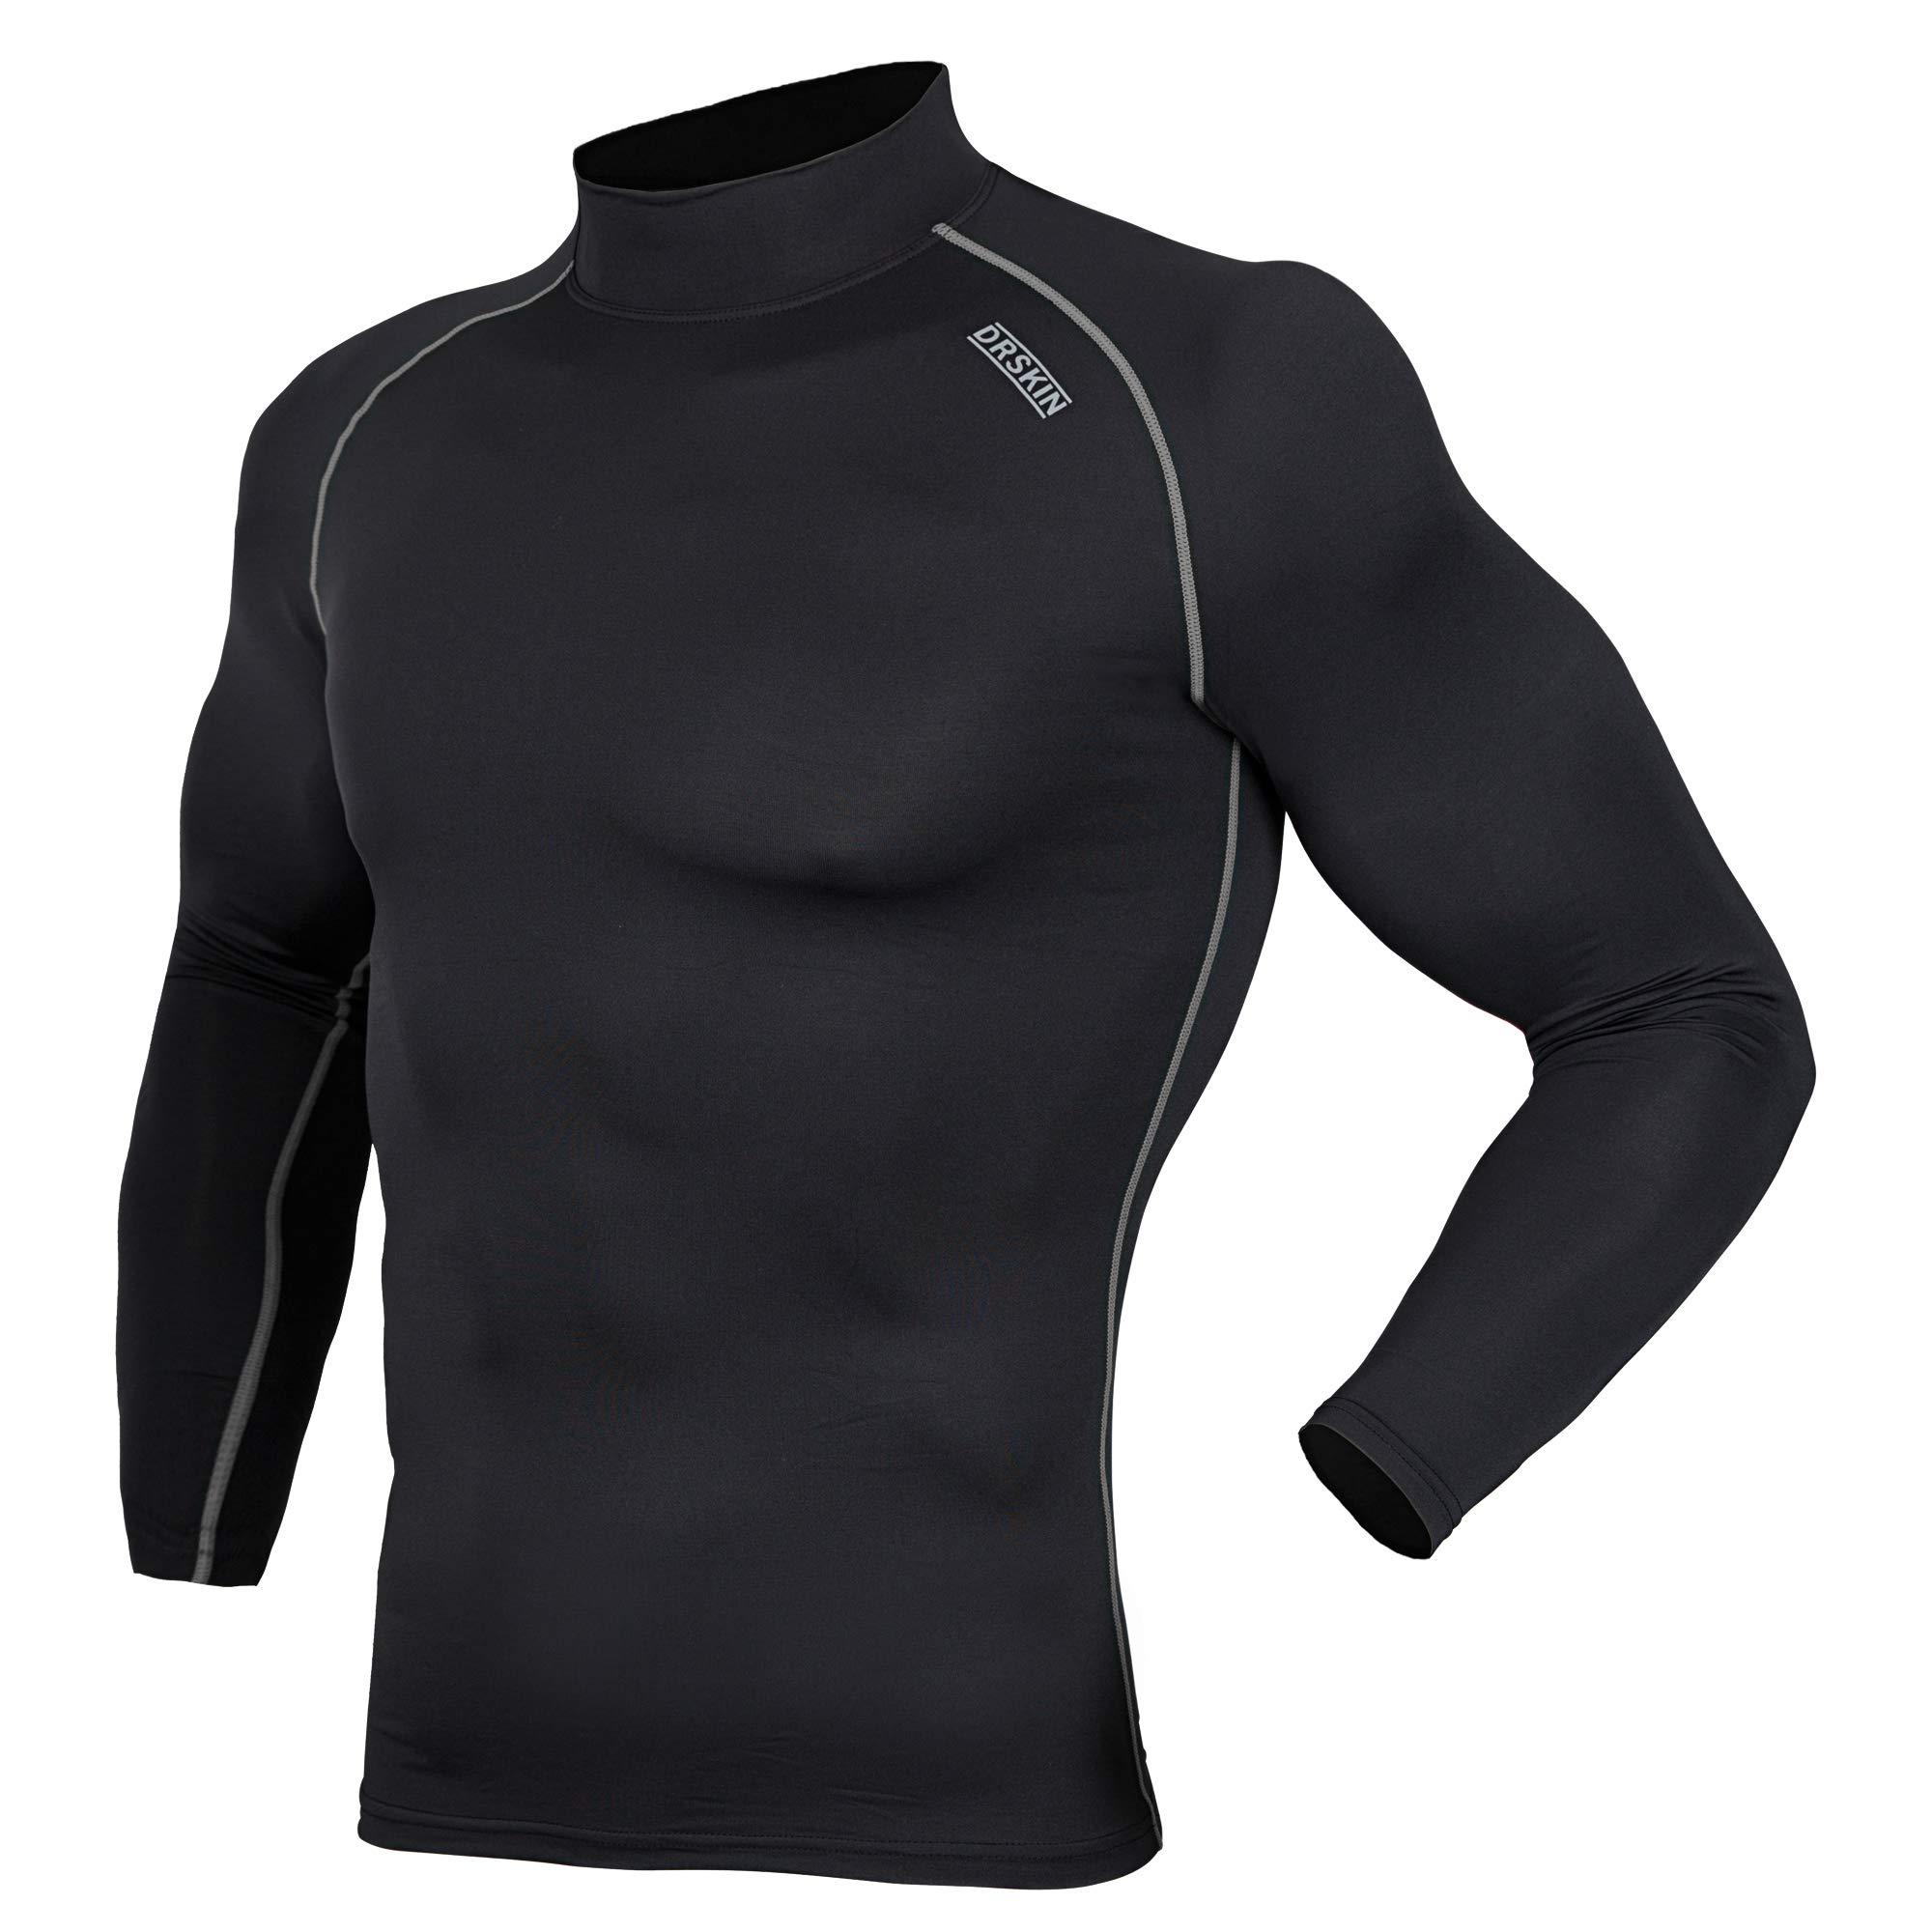 :[DRSKIN] Thermal Fleece Coldgear Tight Compression